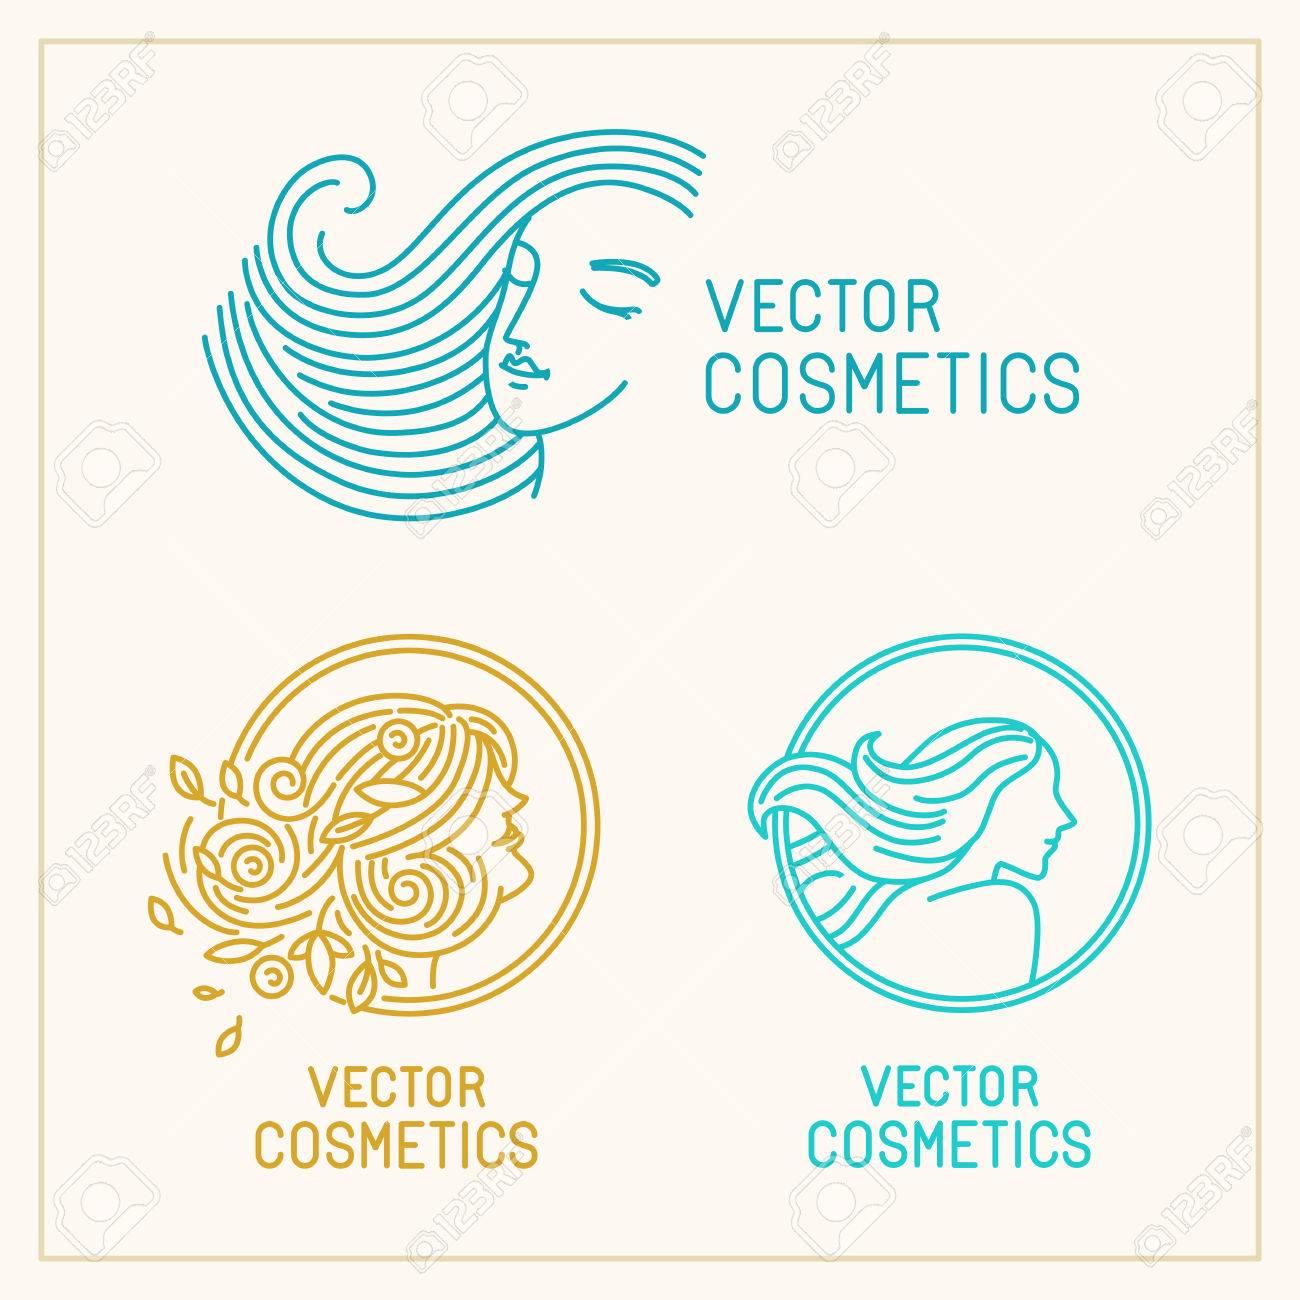 Vector Set Of Logo Design Templates And Abstract Concepts Woman - Logo creator templates